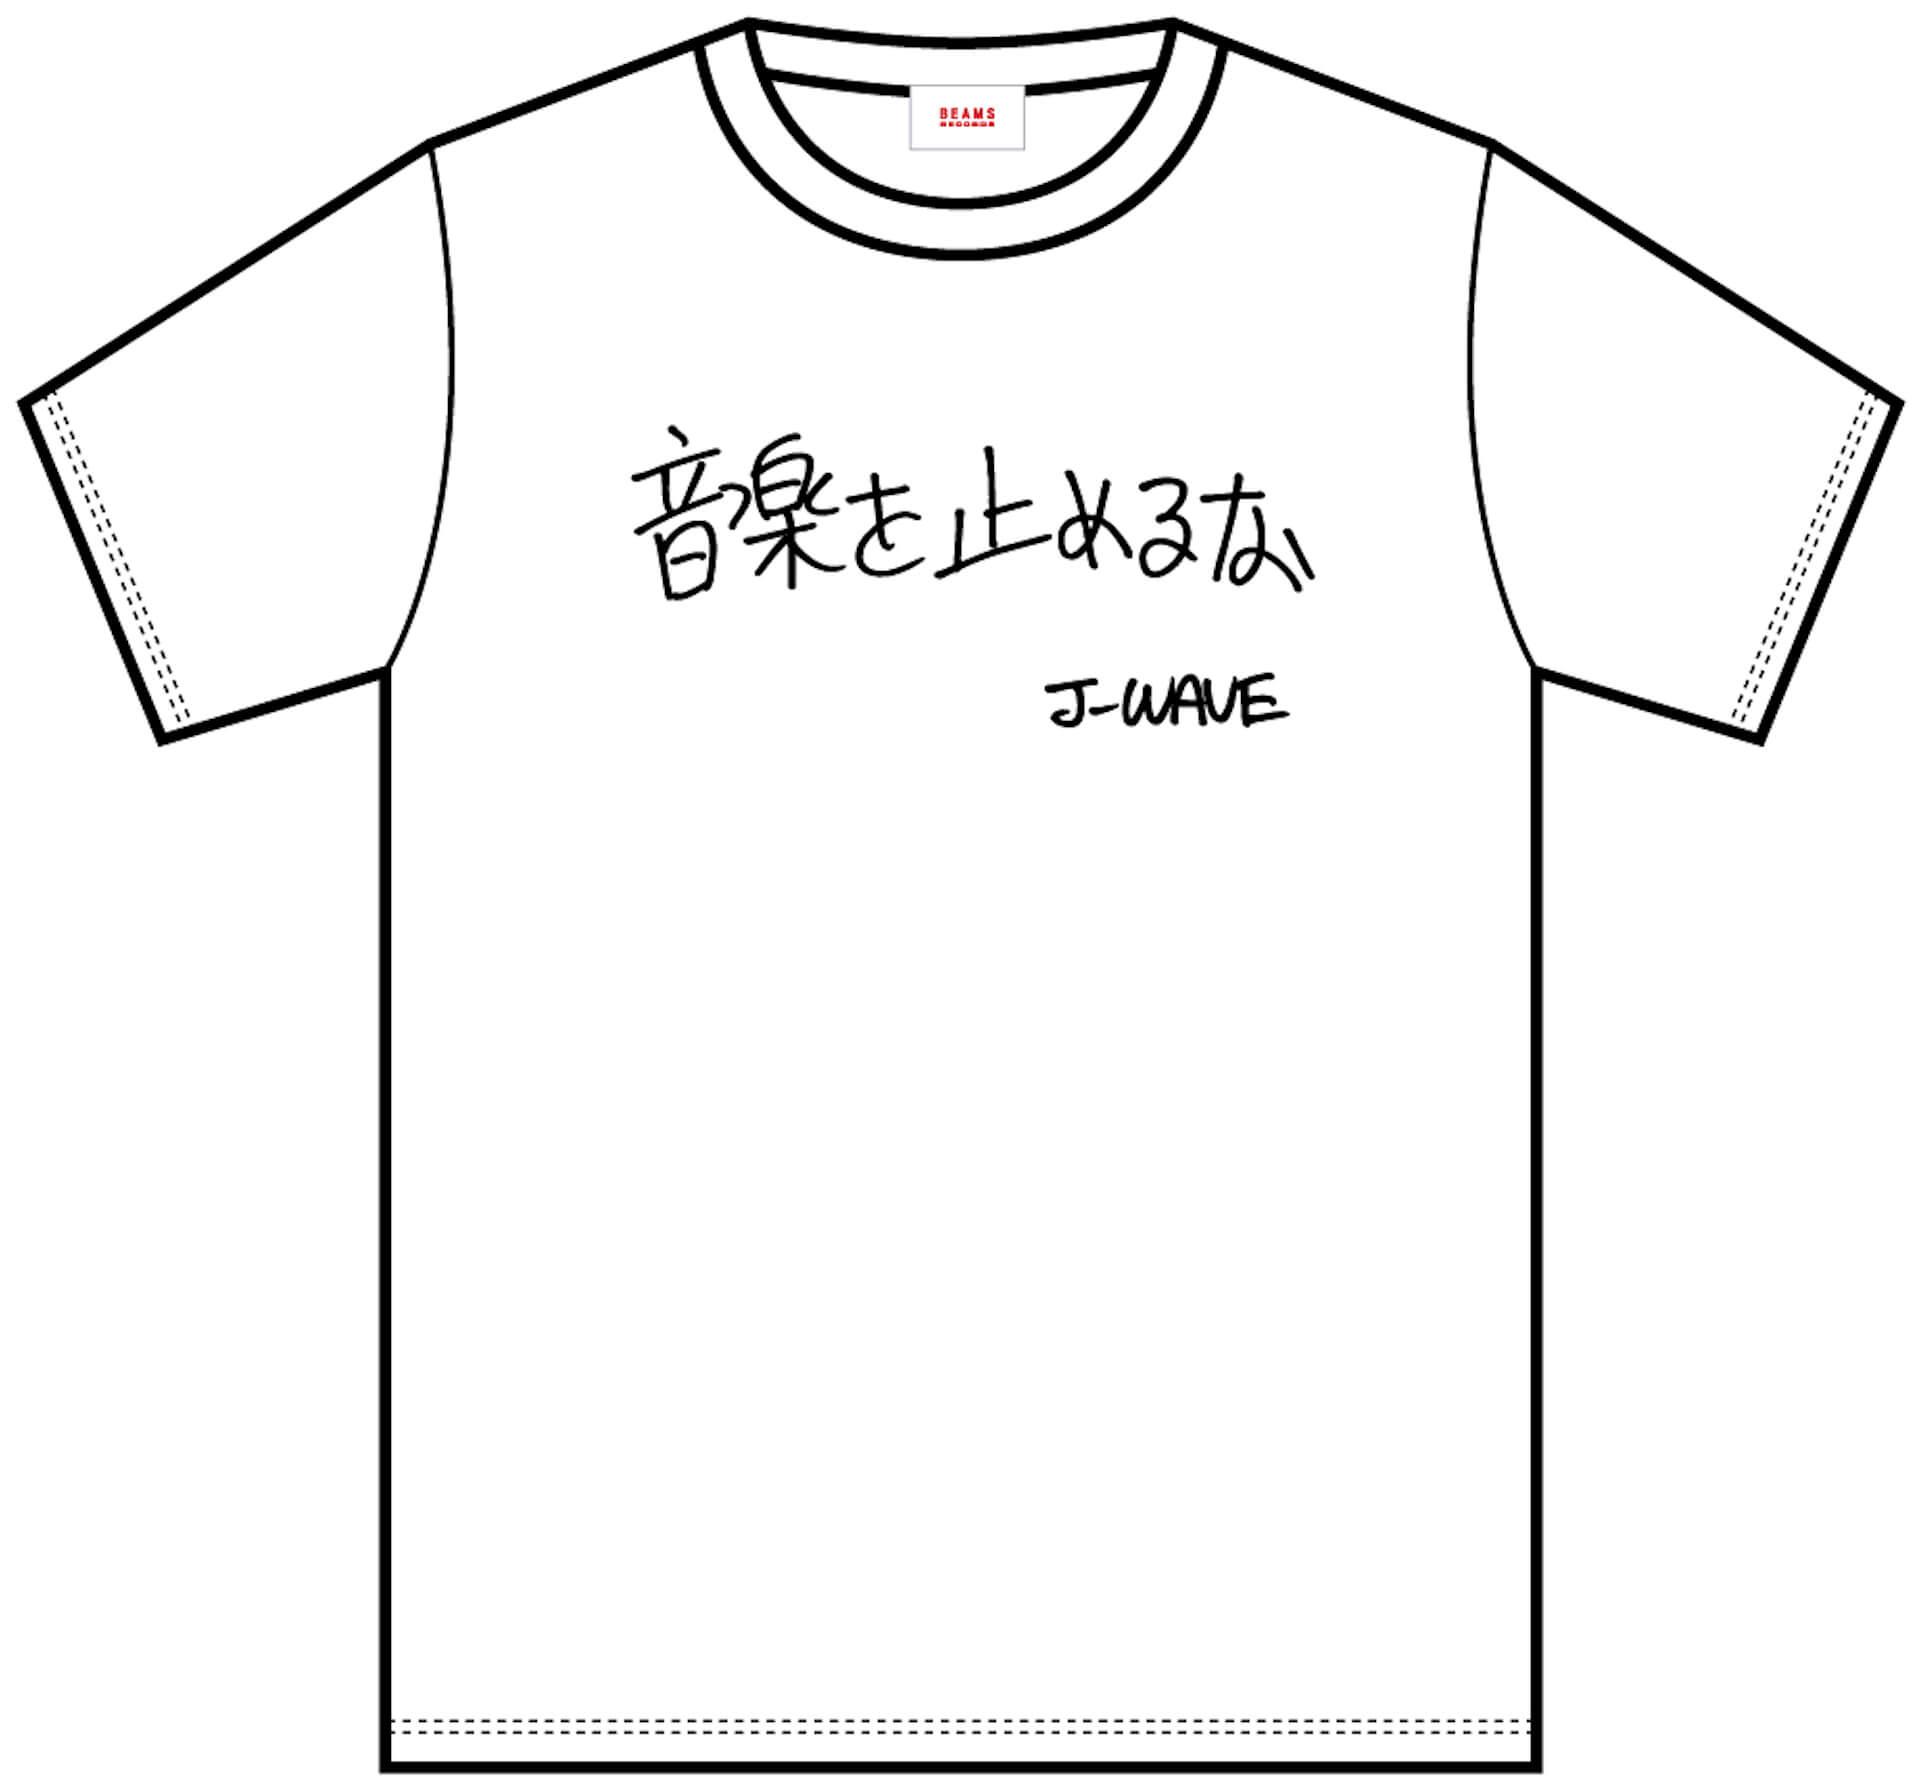 J-WAVE「#音楽を止めるな」BEAMS RECORDS協力のもと、ライブハウスを支援するオリジナルTシャツが受注販売開始! lf200515_jwave_beamsrecords_tshirts_10